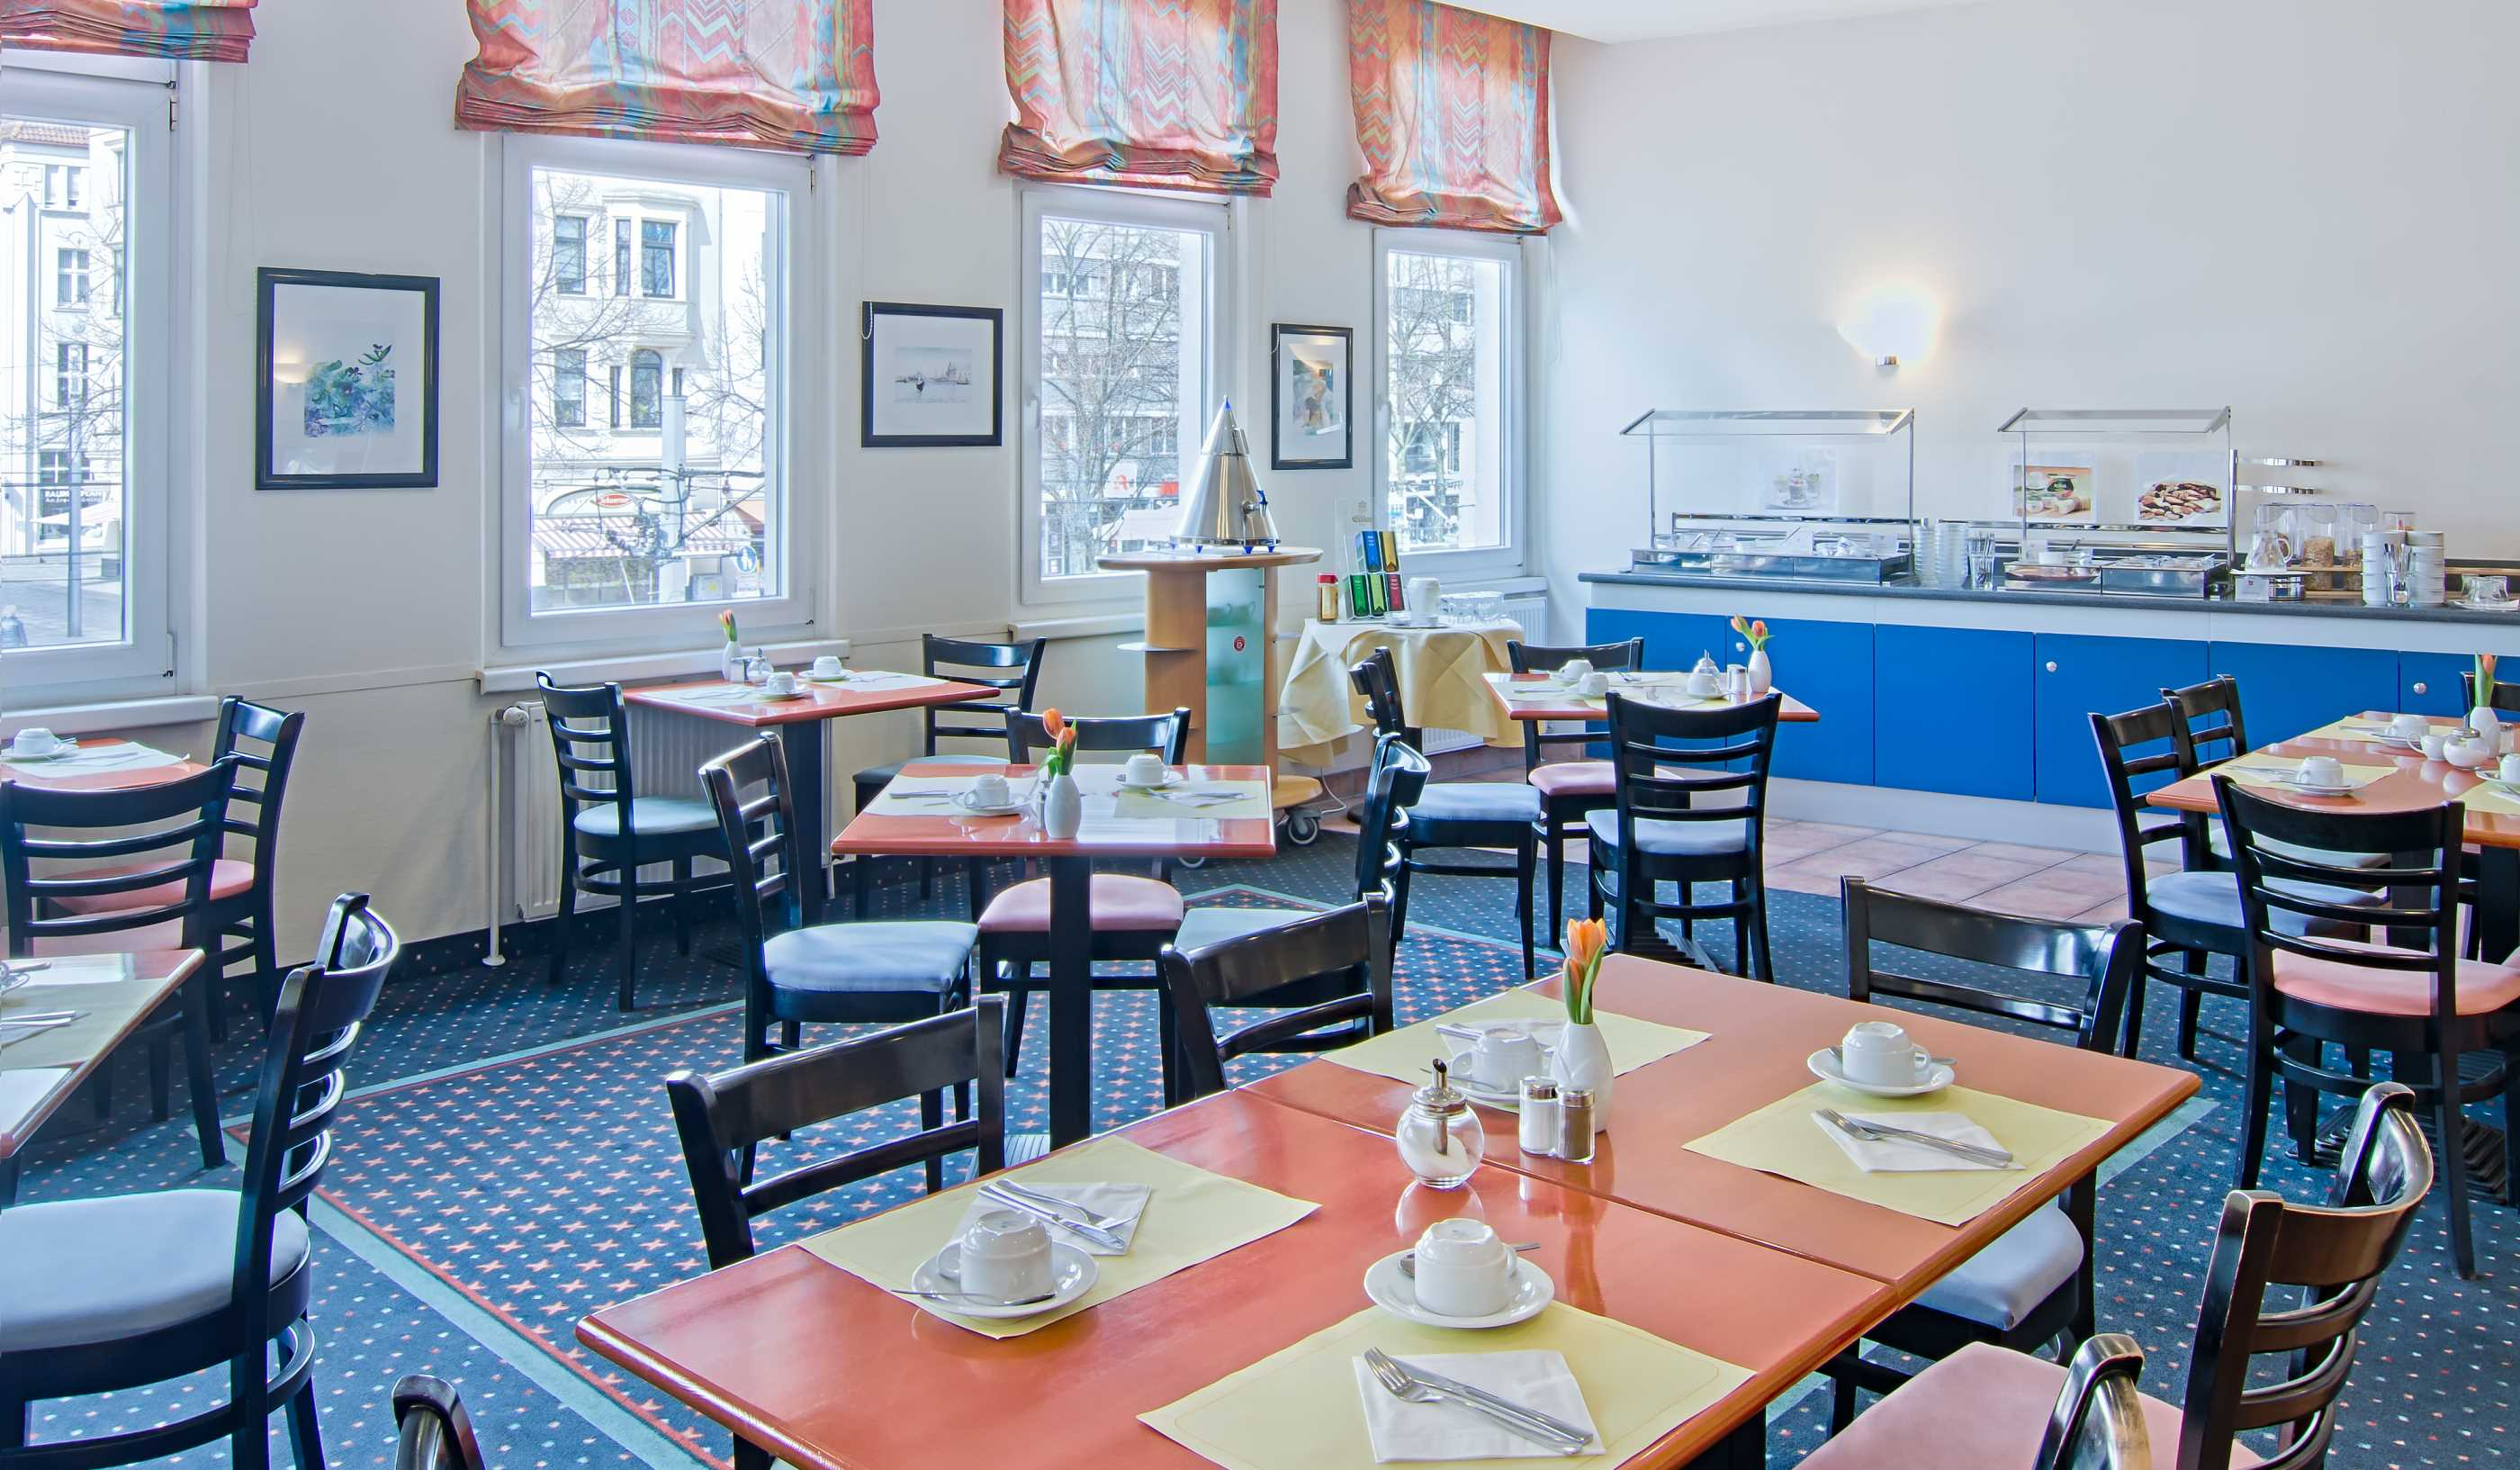 arcadia_hotel_bielefeld_restaurant2